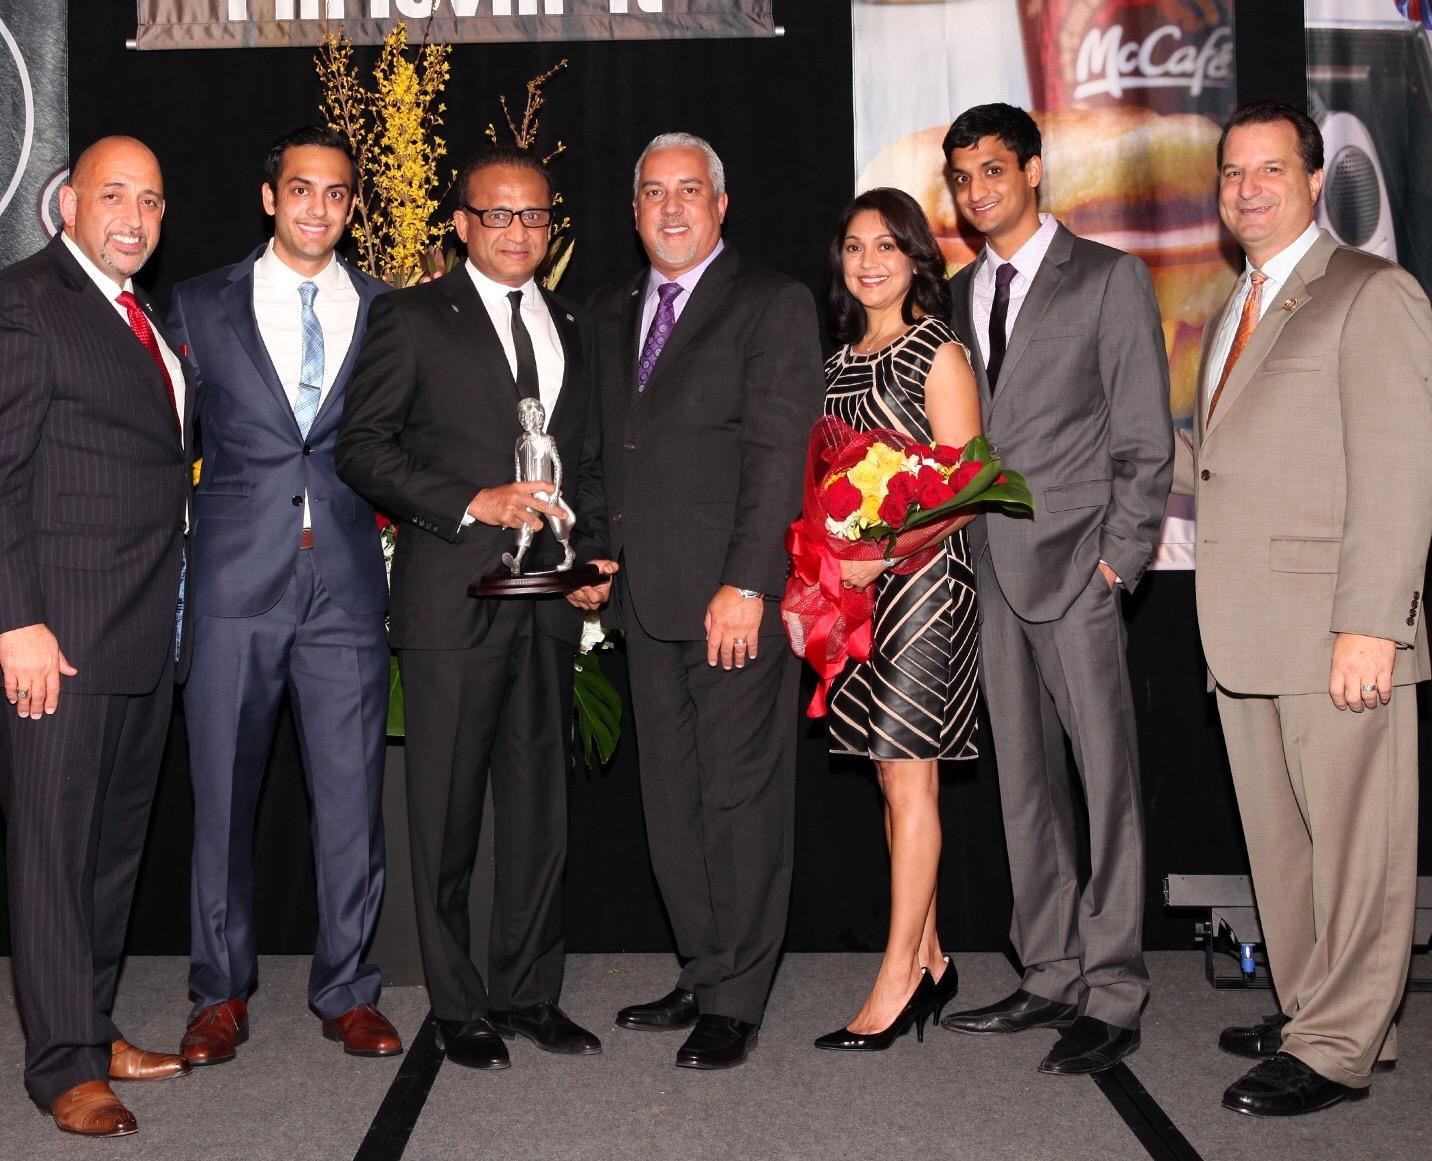 McDonald's Patey Wins Ronald Award Nov 2015 PHOTO_1447186404586.jpg